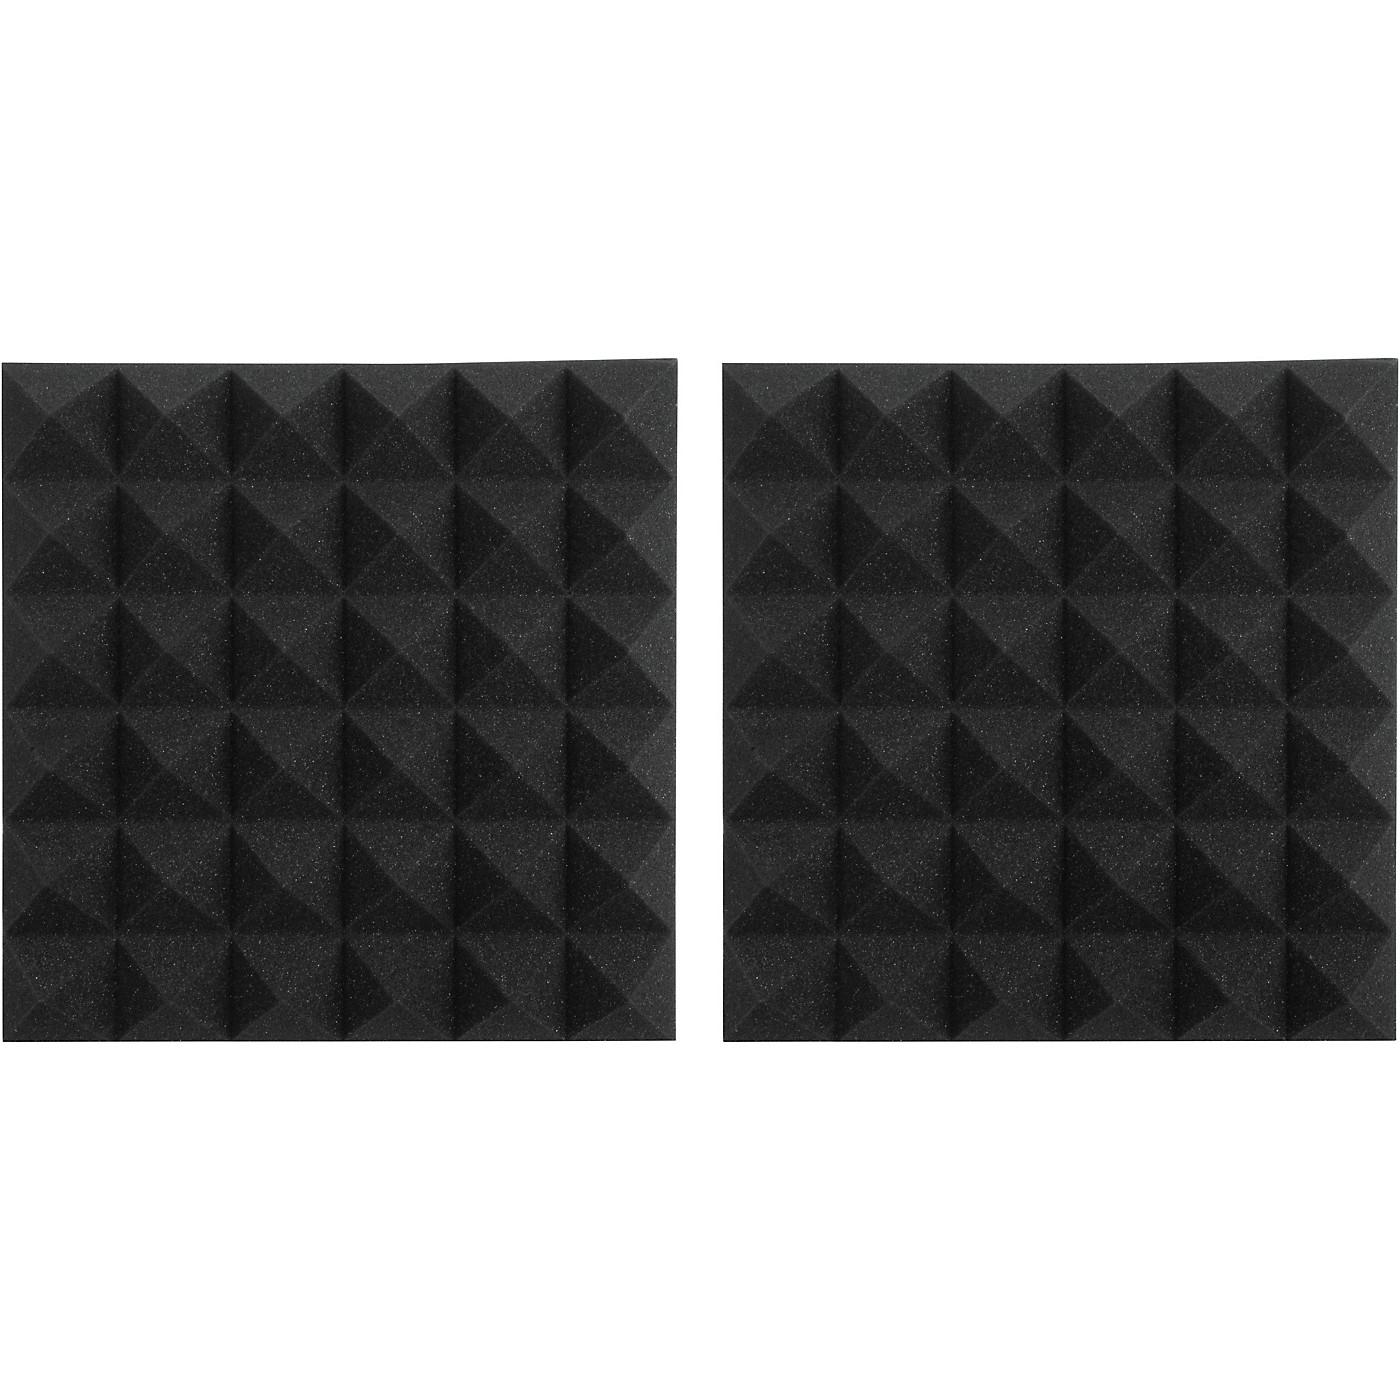 Gator GFW-ACPNL1212P-2PK Pair of 2 Inch - Thick Acoustic Foam Pyramid Panels 12x12 thumbnail